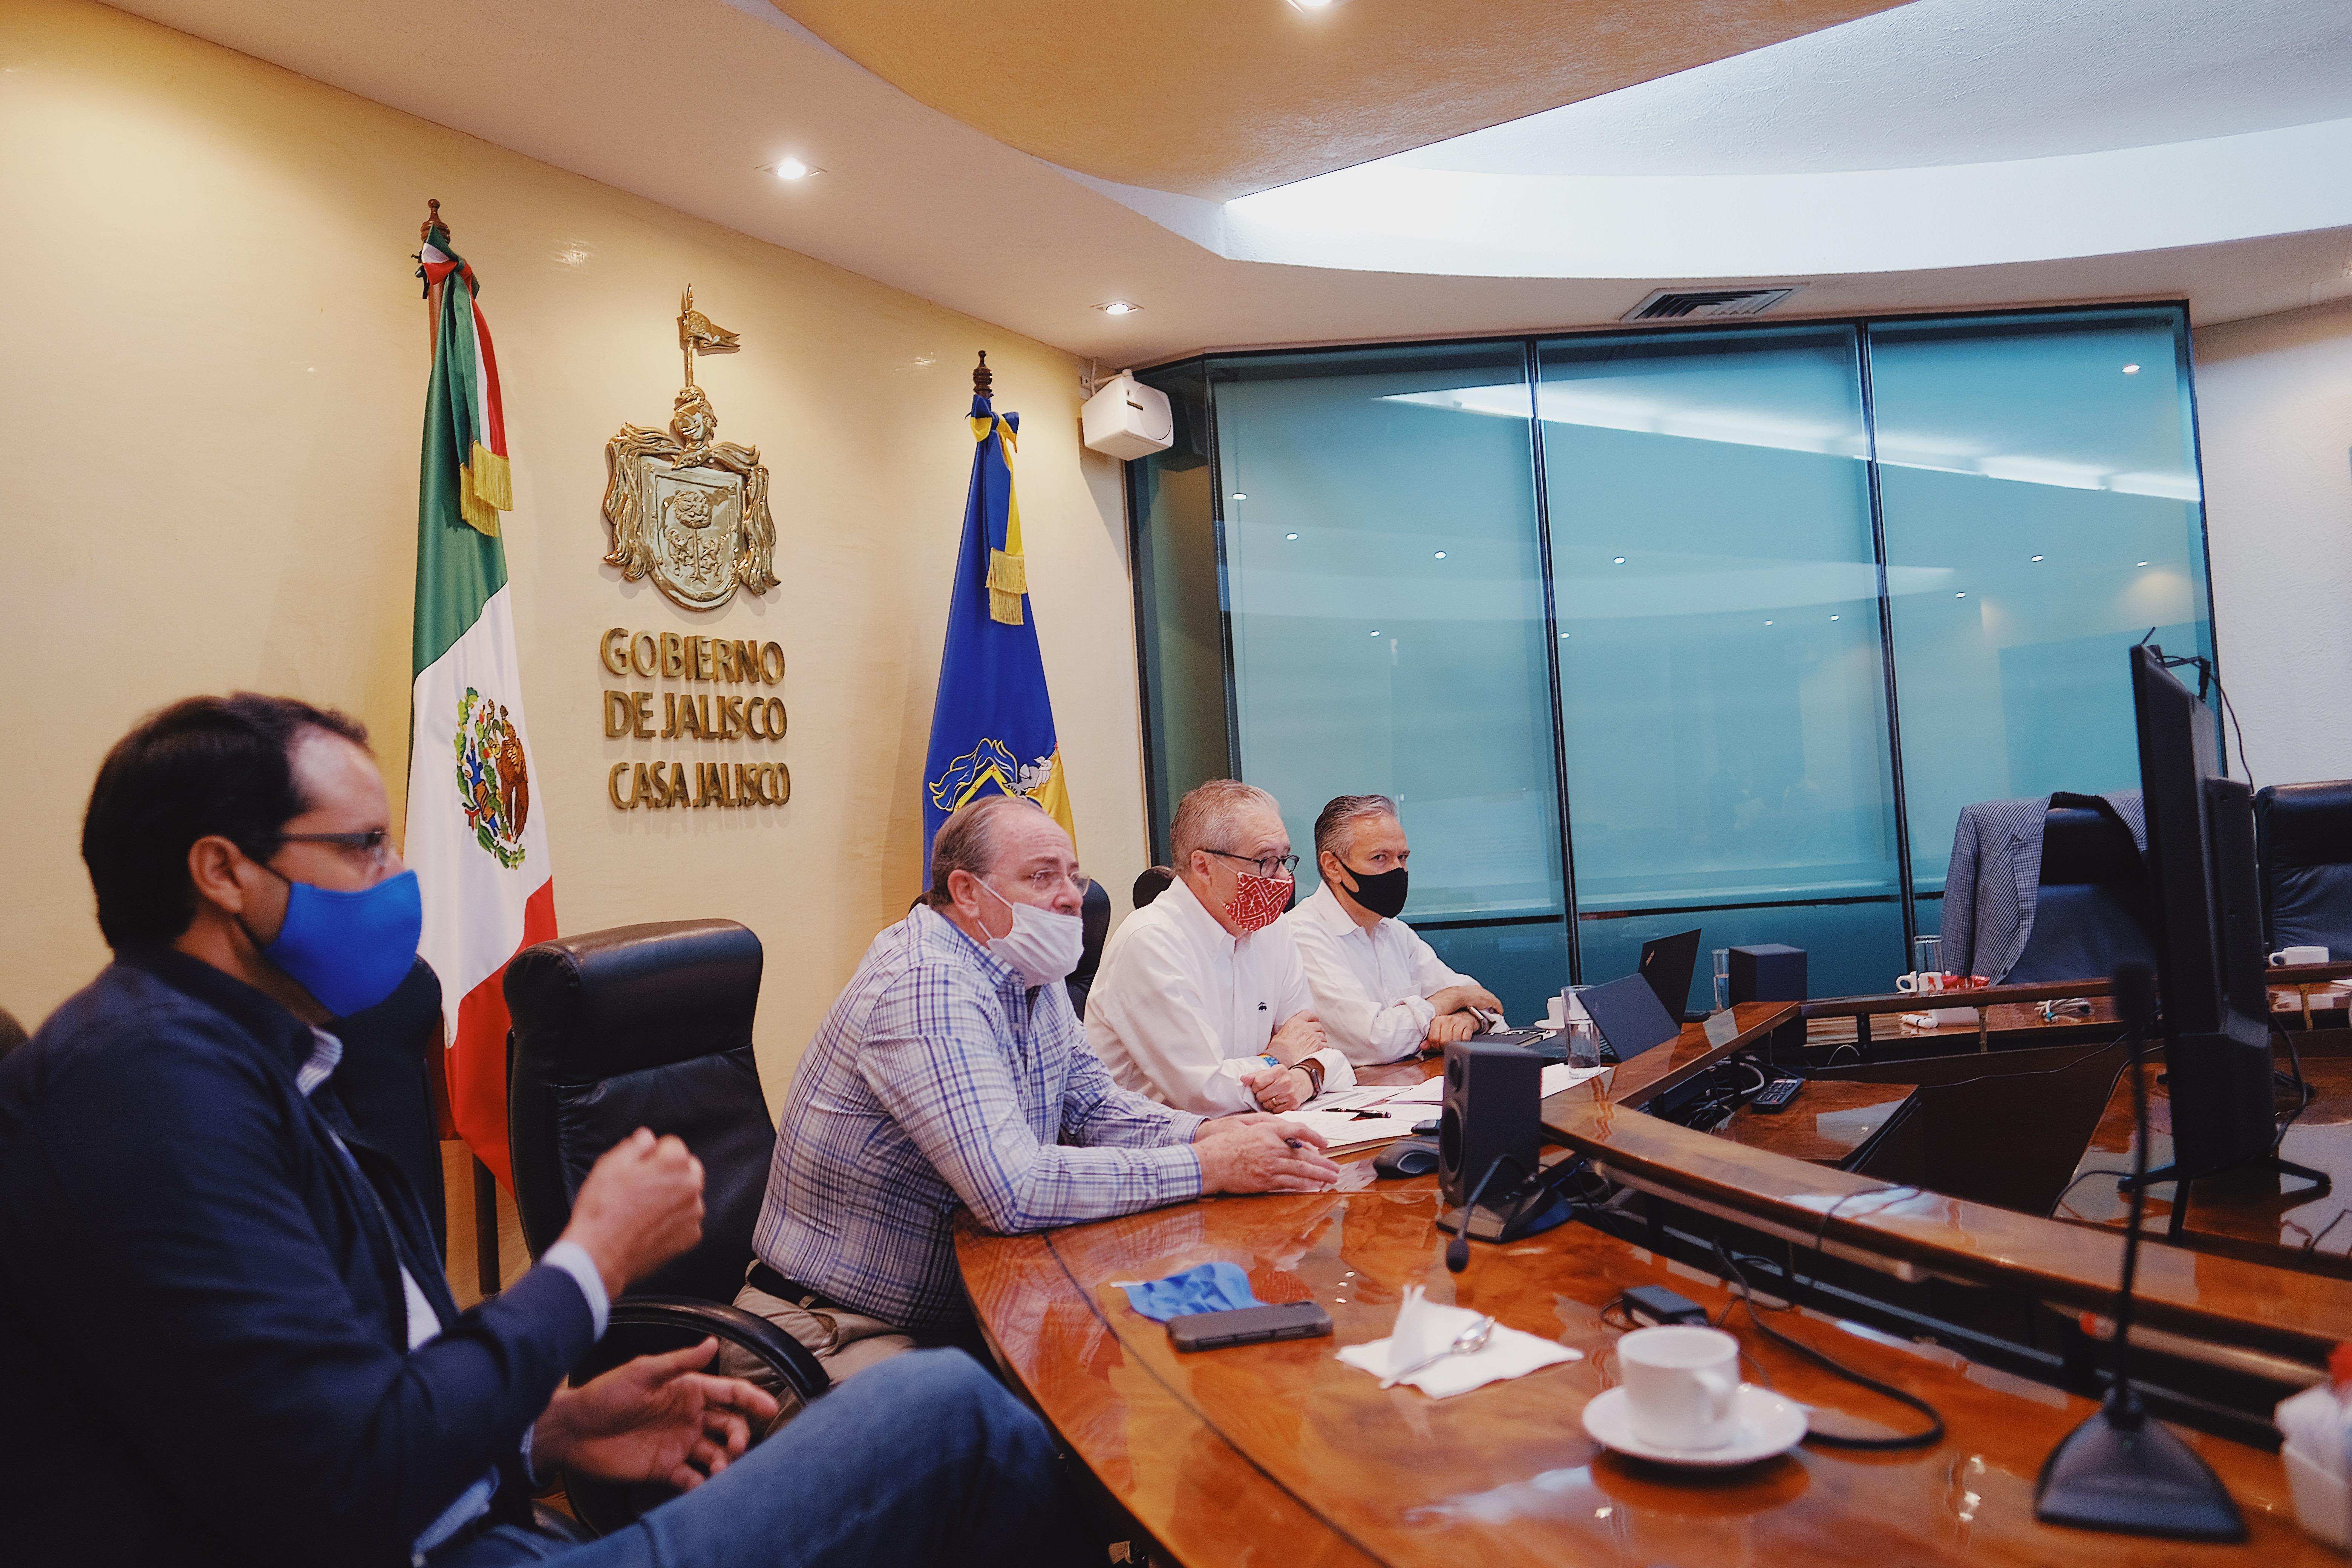 Gobierno de Jalisco presenta fase 0 del Plan de Reactivación Económica a Presidentes municipales